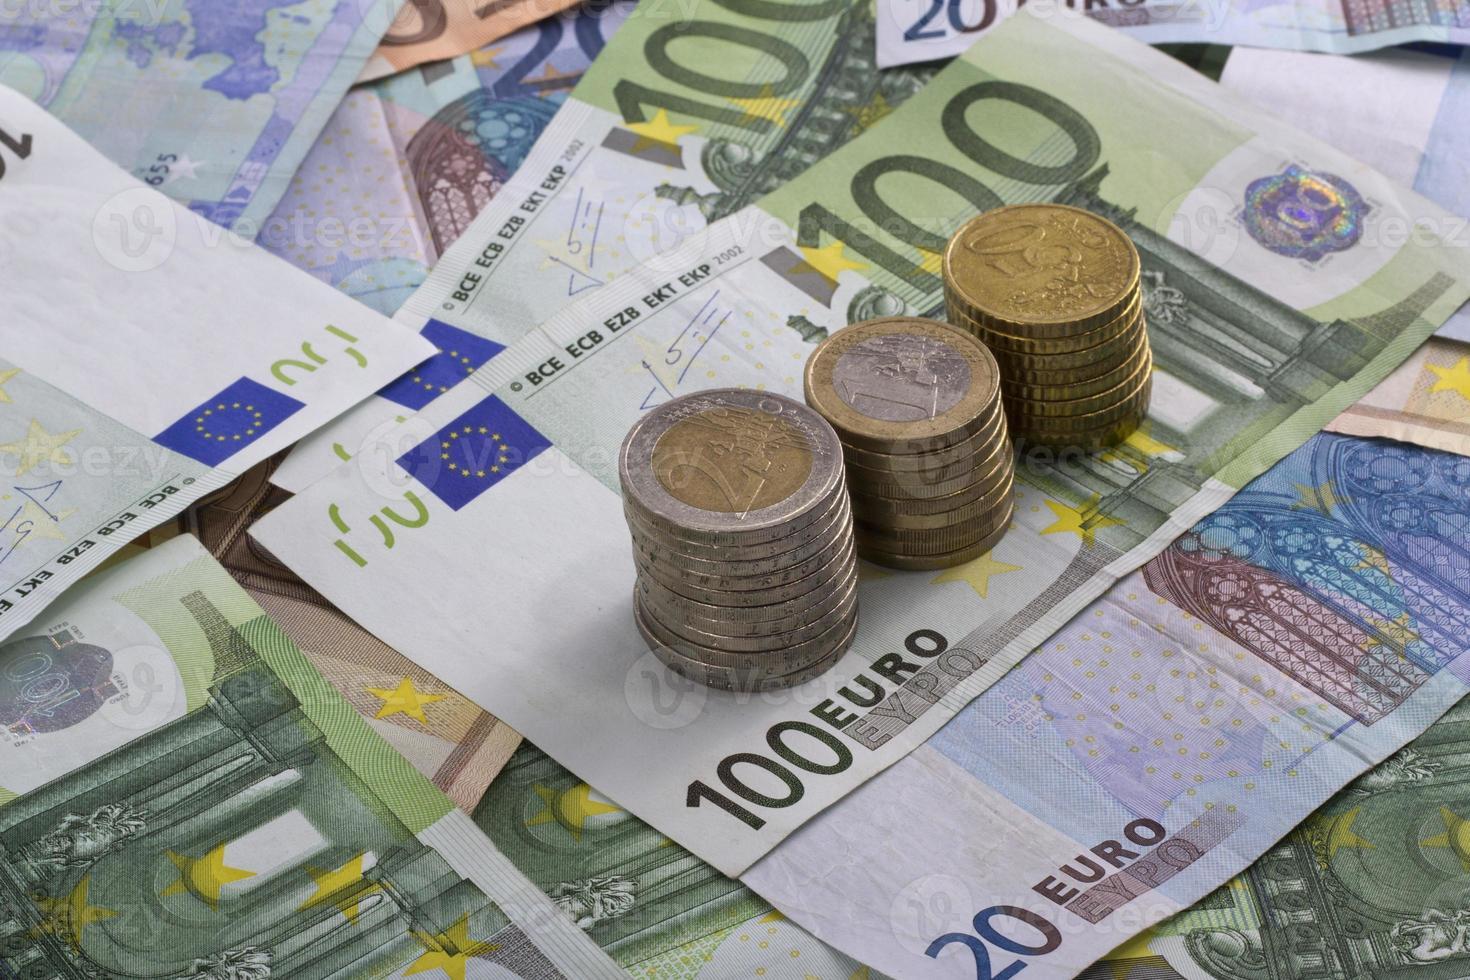 eurobankbiljetten munten geld geïsoleerd foto